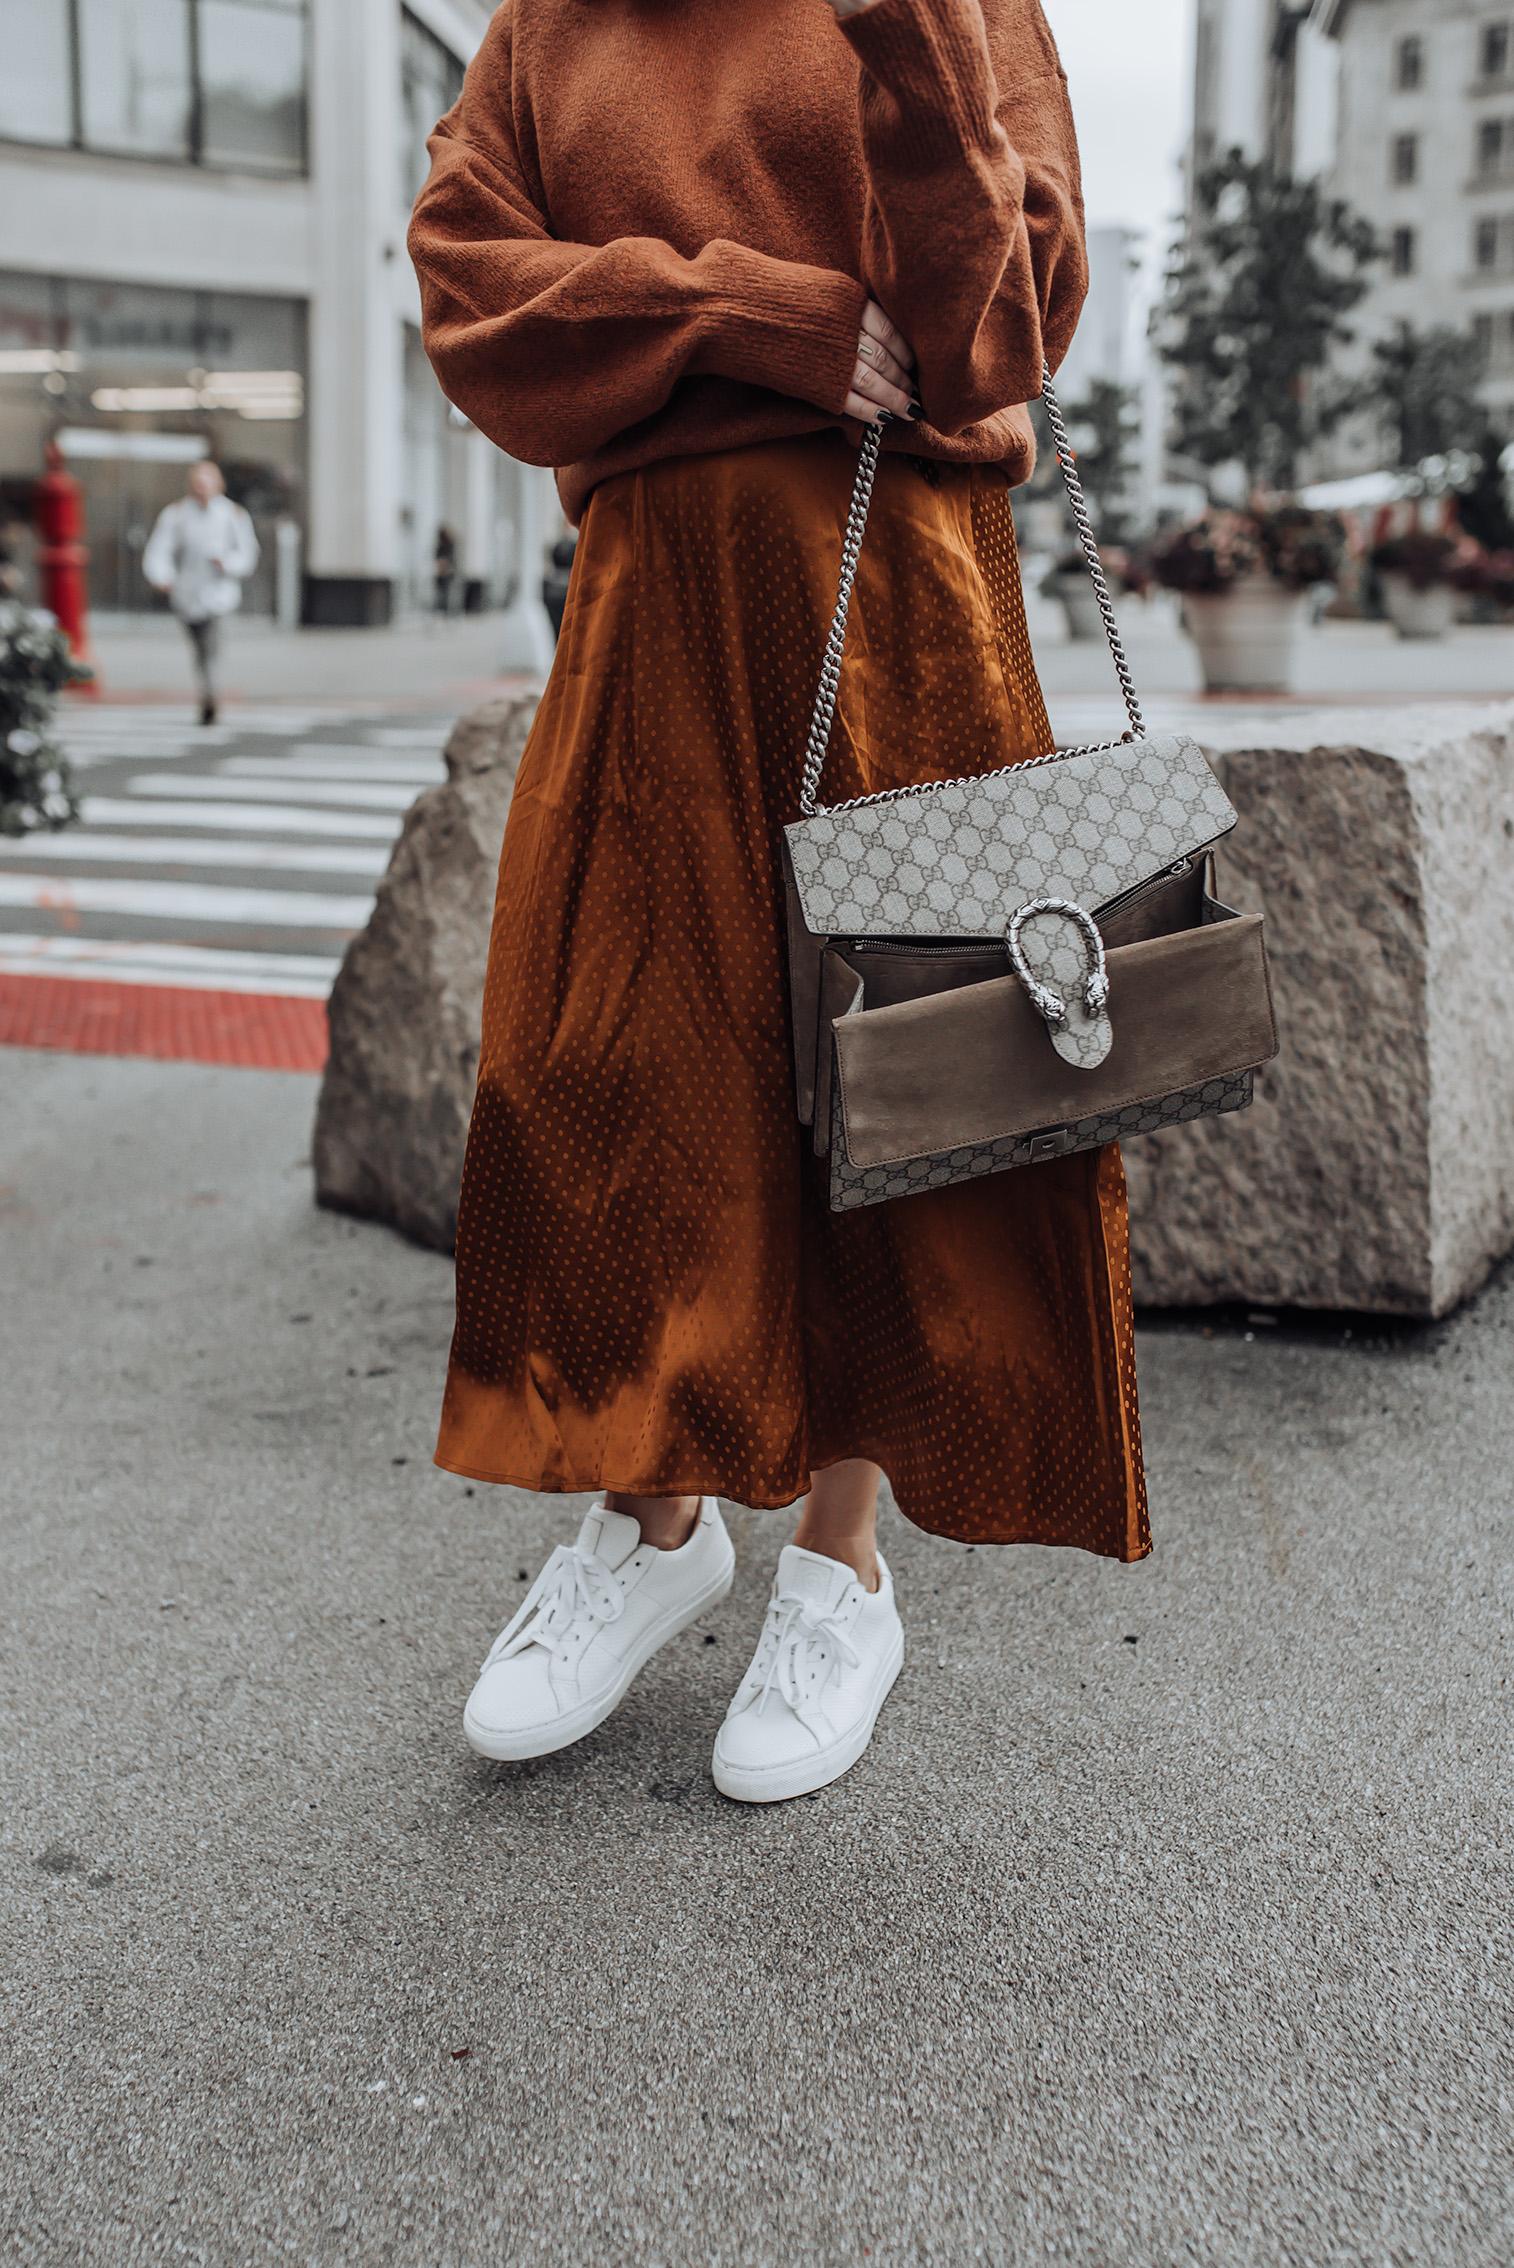 Fall tones   Midi Dress   Mock Neck Sweater   Gucci Bag   Glasses #streetstyle #ootd #liketkit #gucci